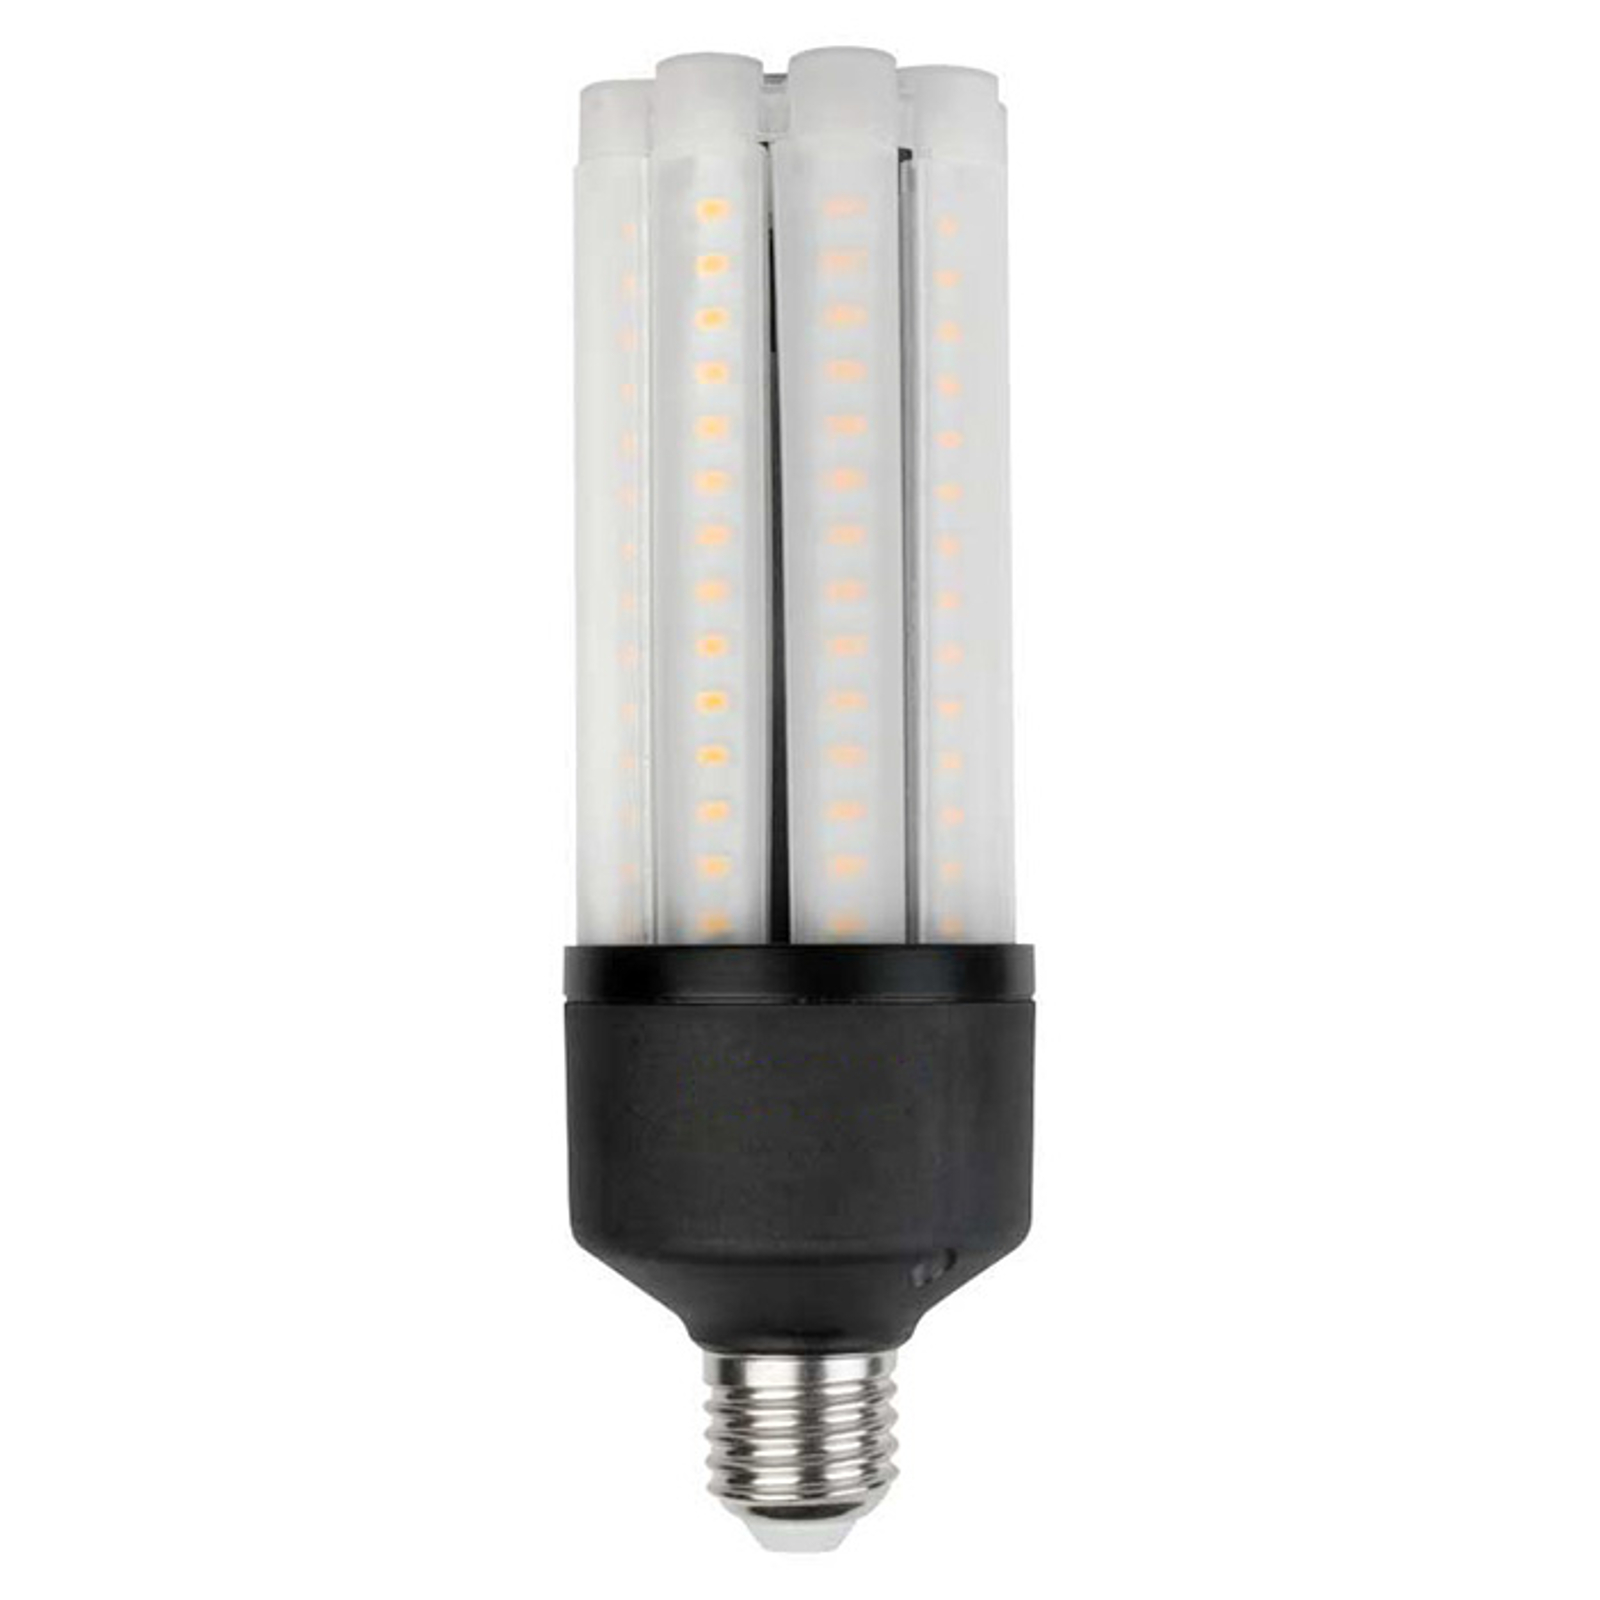 E27 35W LED clusterlamp MEGAMAN, warm wit